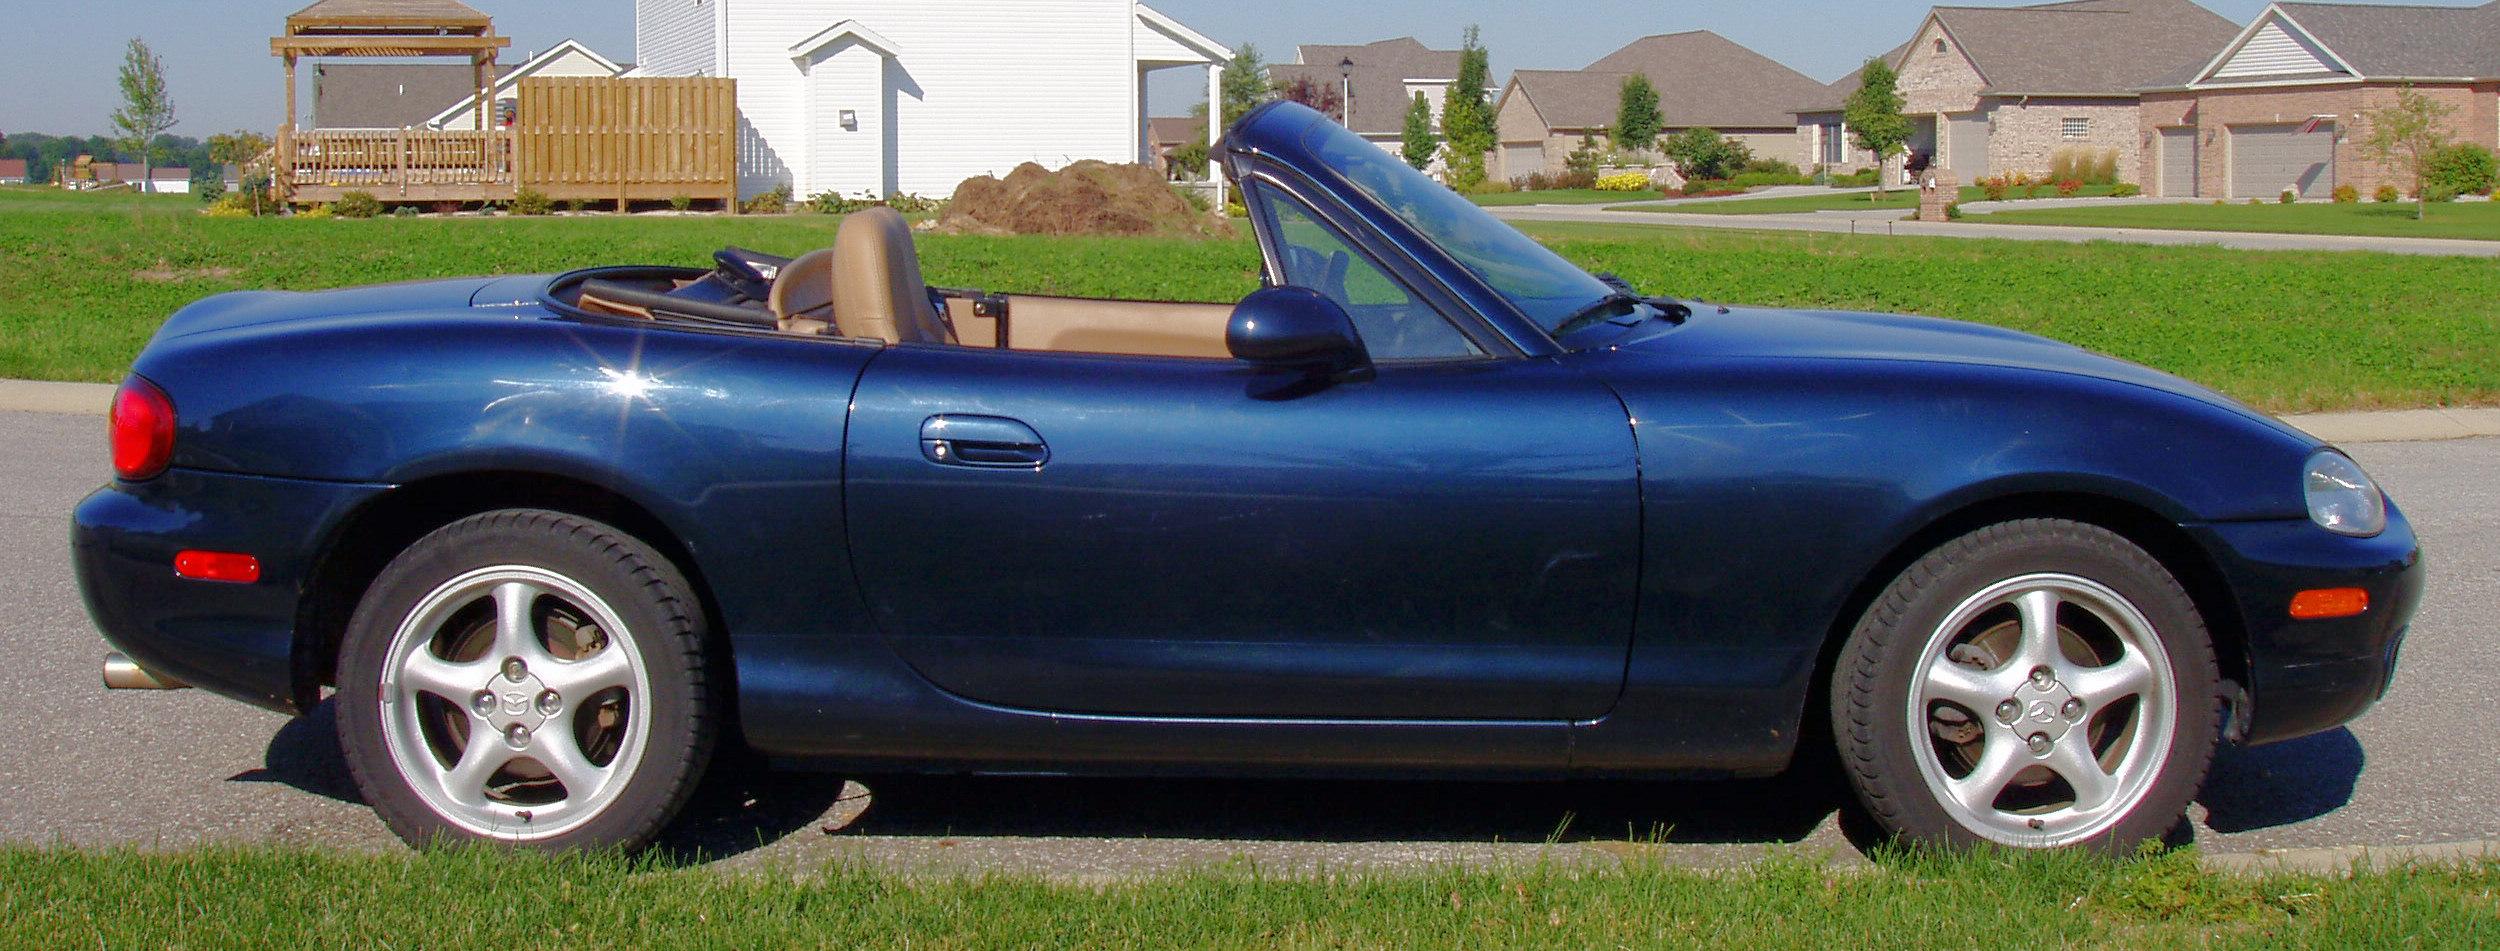 https://upload.wikimedia.org/wikipedia/commons/7/7f/Mazda-miata-1999-blue-side.jpg